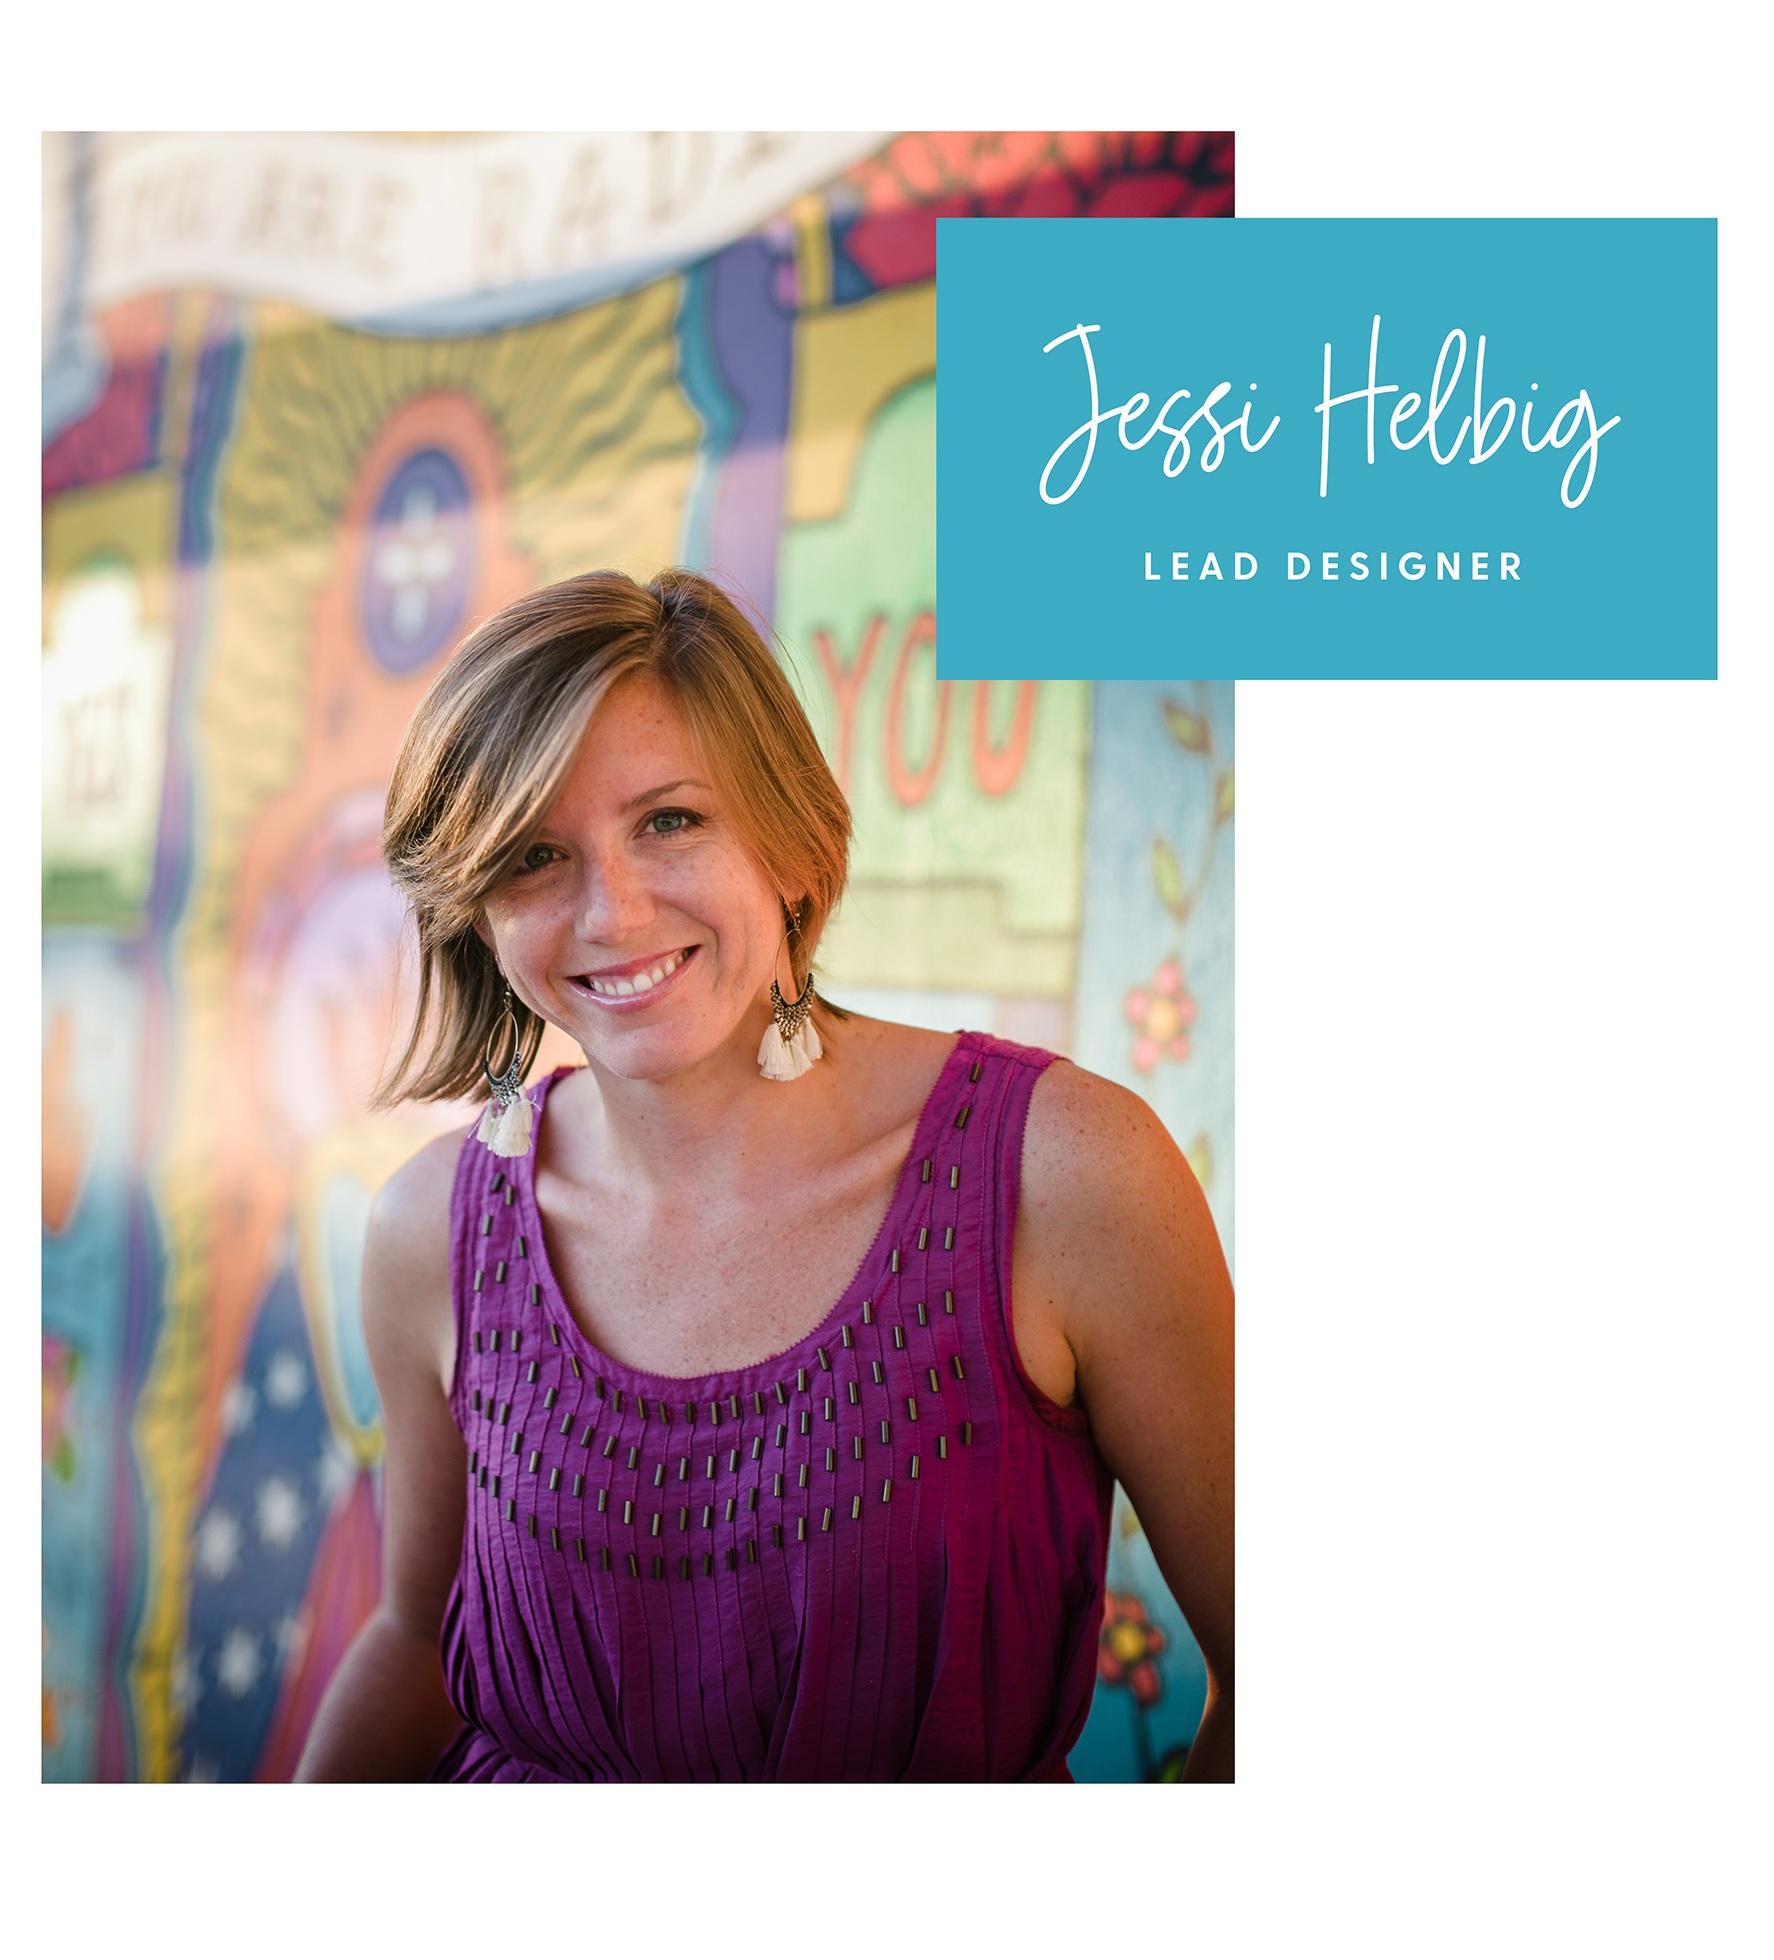 Jessi+Helbig+Blythe+Interiors.jpg